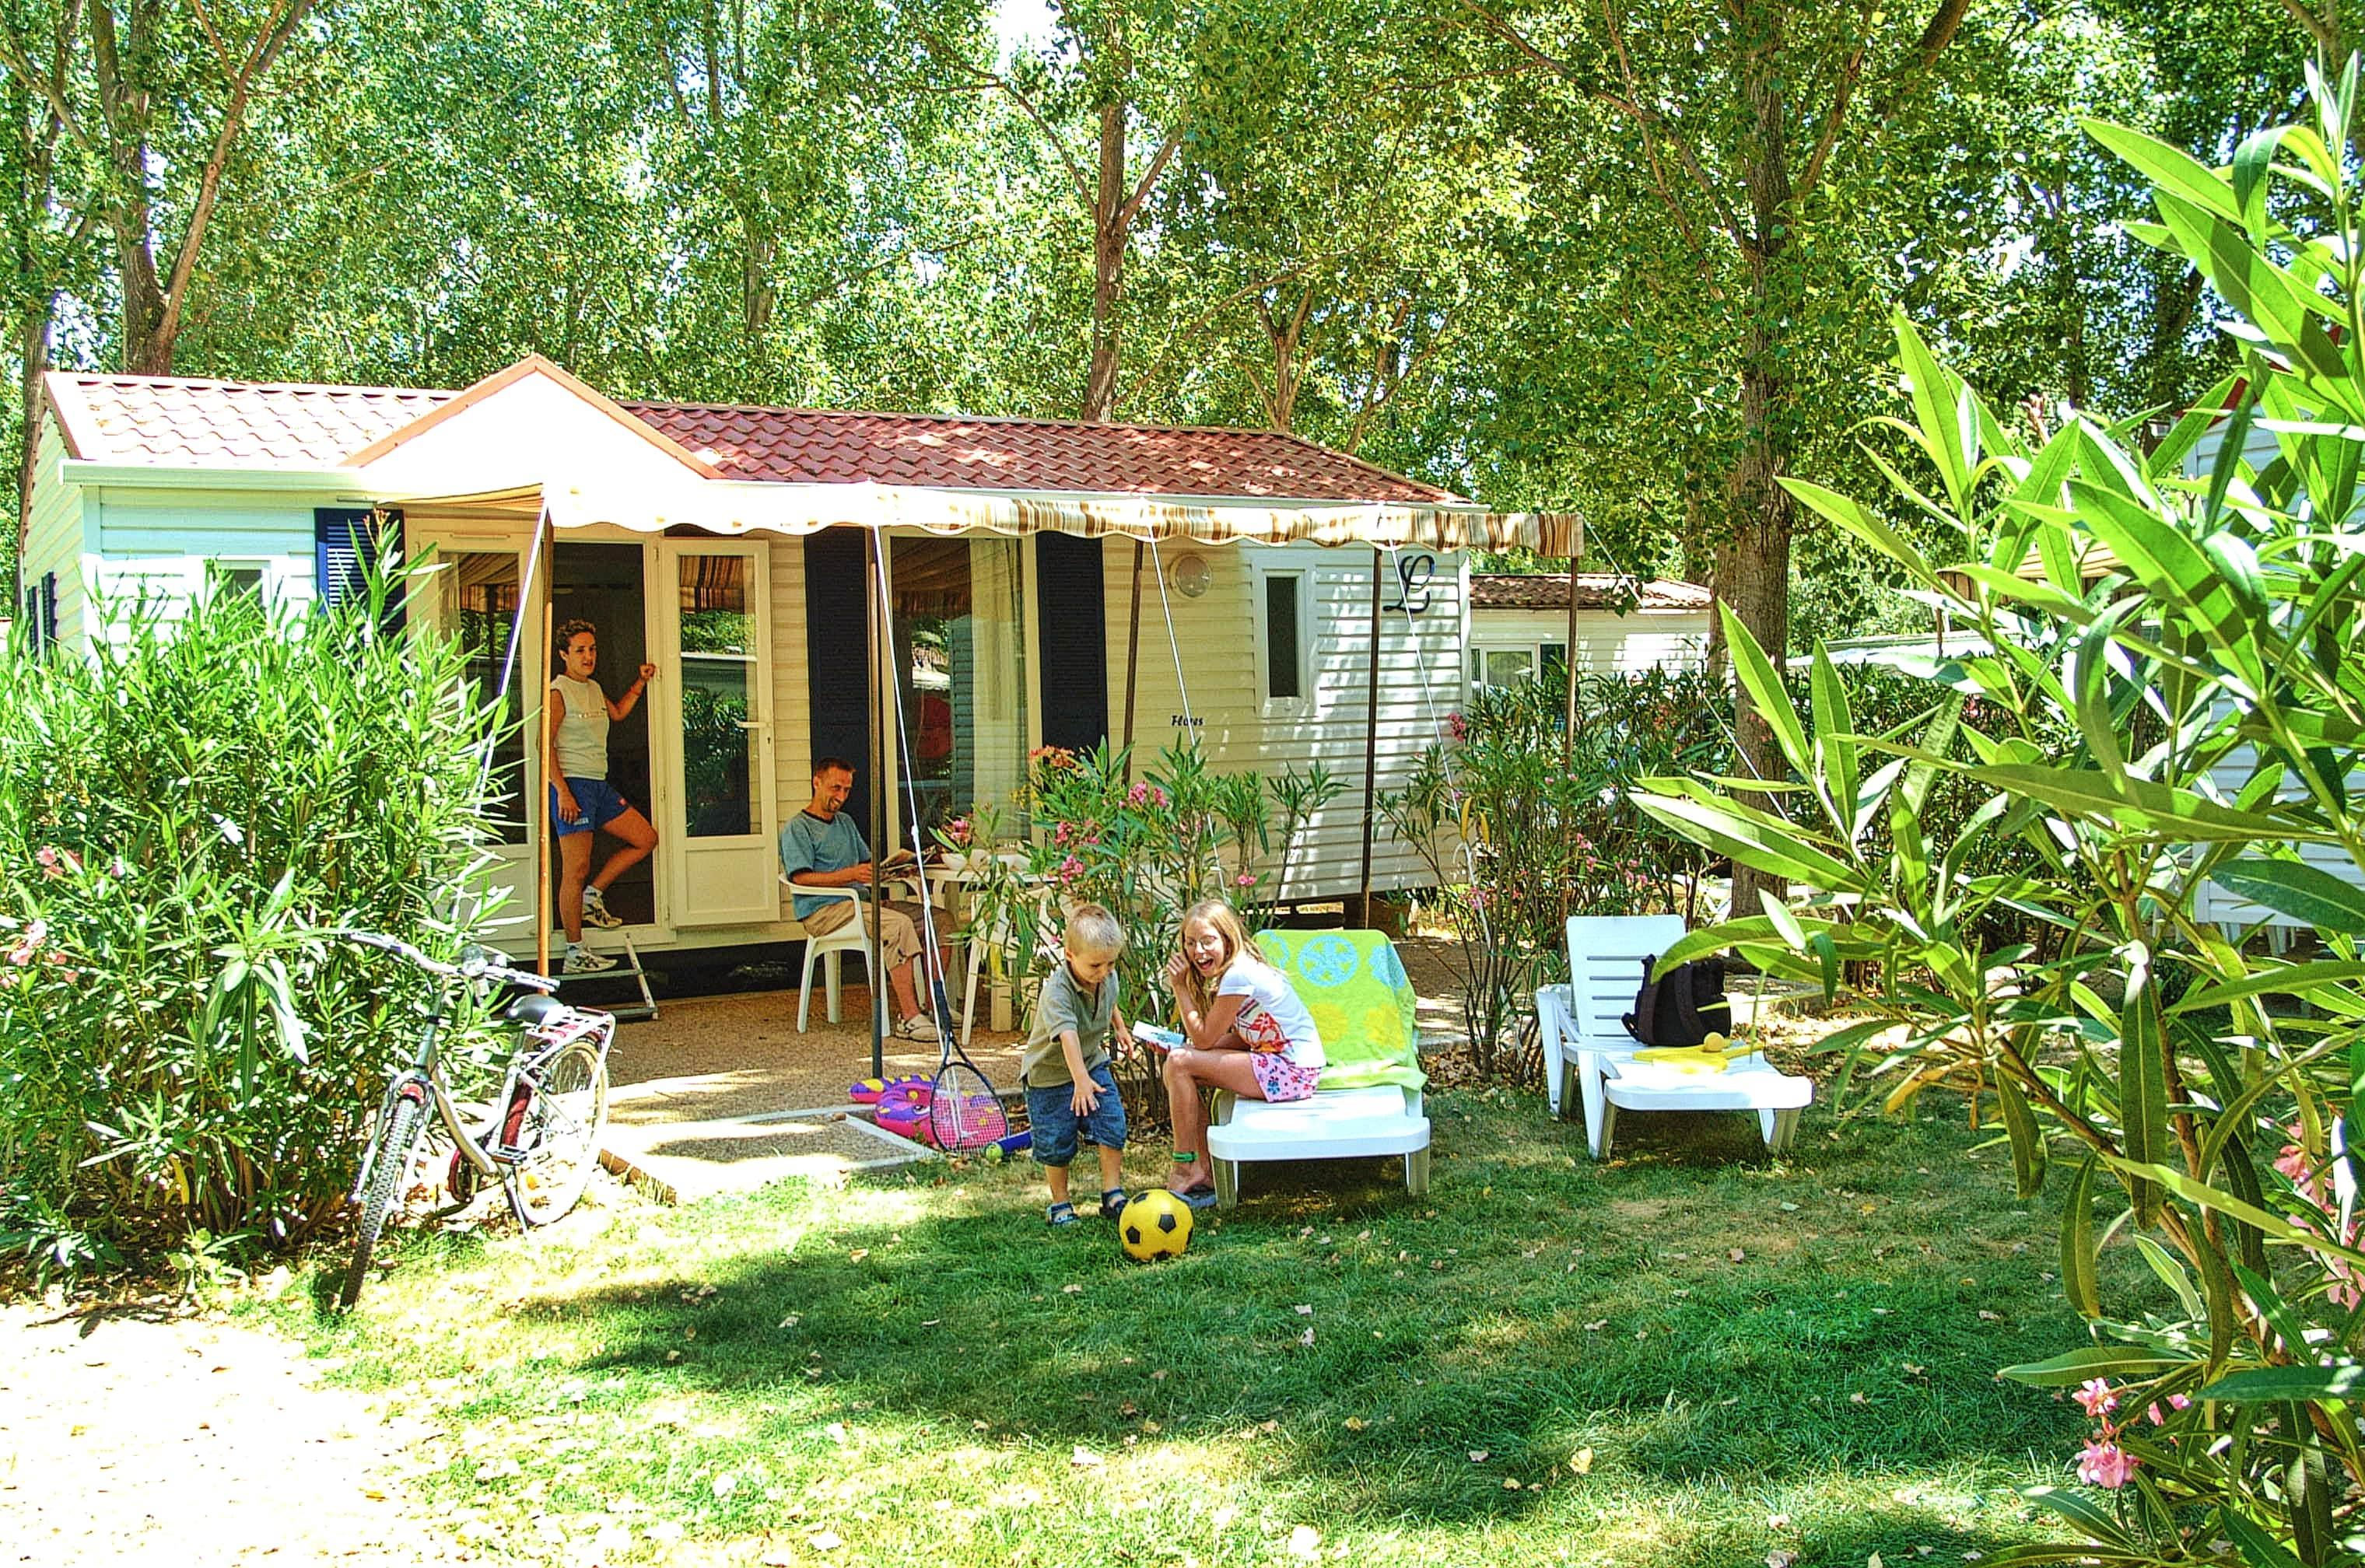 Location - Mexico Classic, Confort - Dimanche - 2 Chambres - Camping L'Air Marin